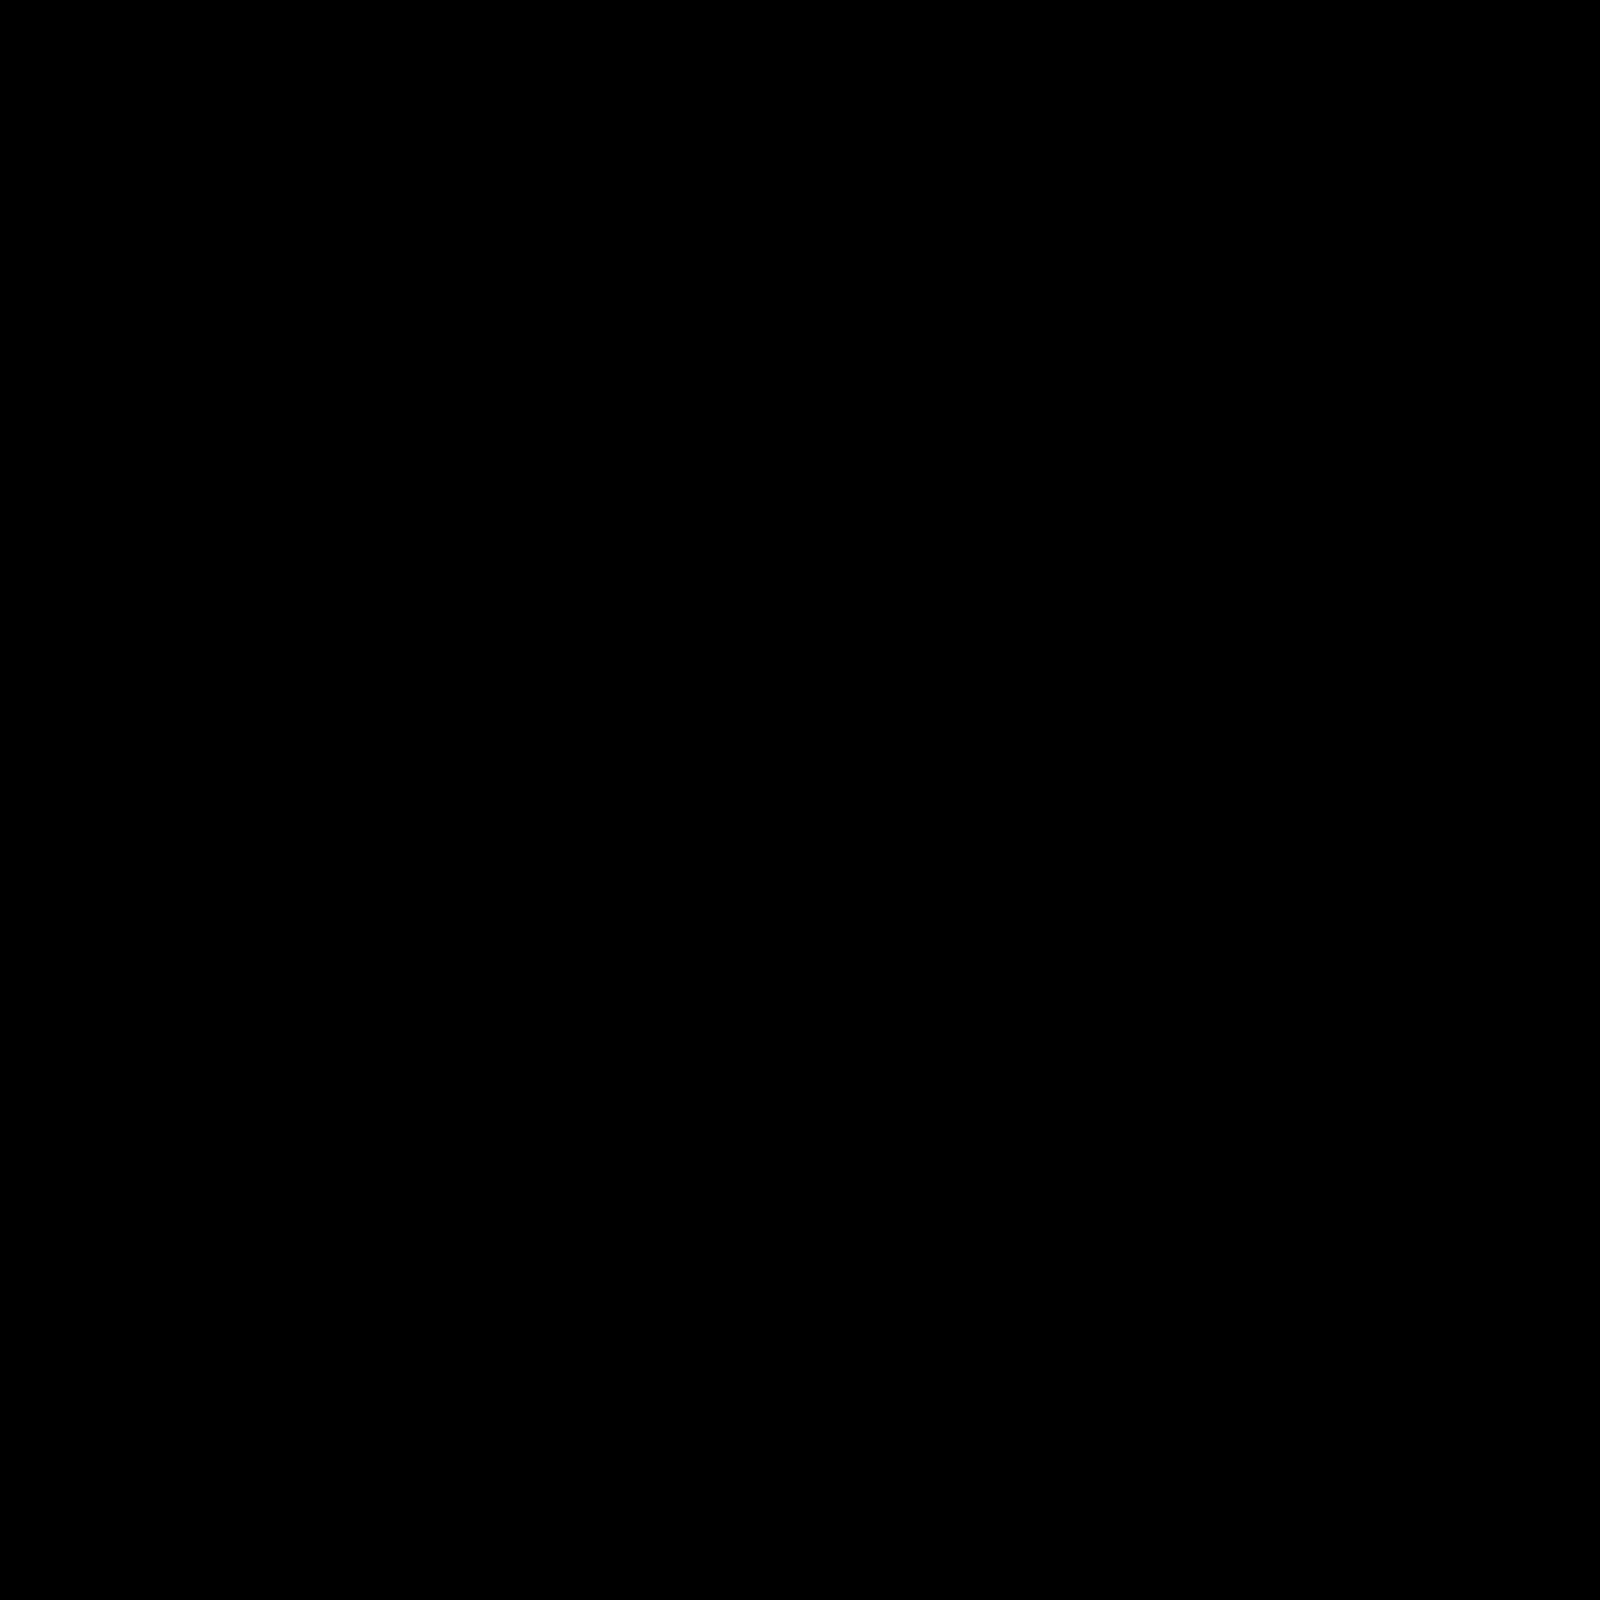 Barber Scissors icon